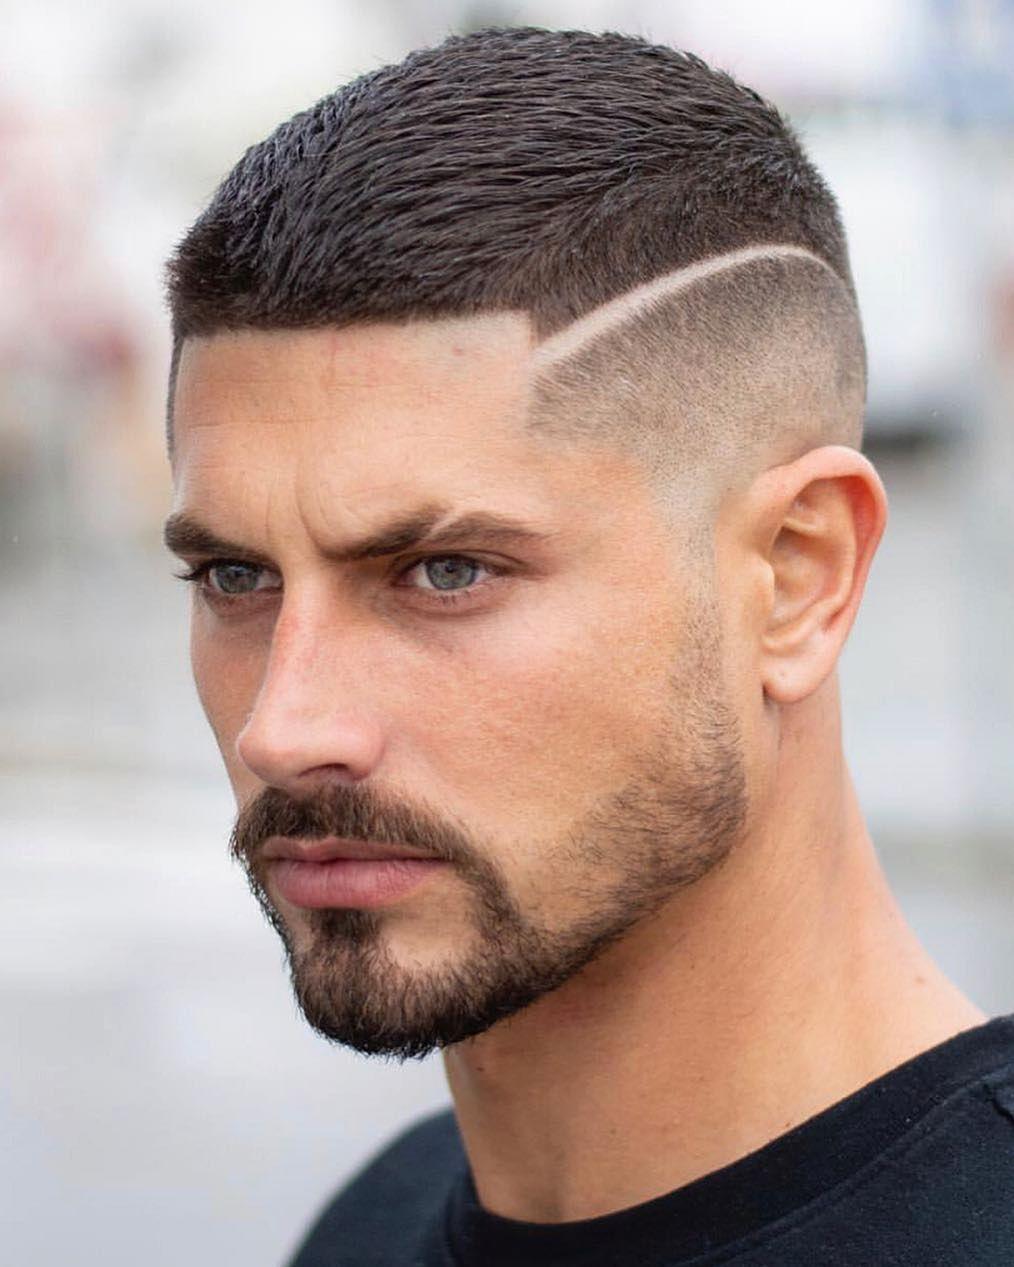 Tough Hair Look Men Mens Haircuts Short Haircuts For Men Mens Haircuts Fade